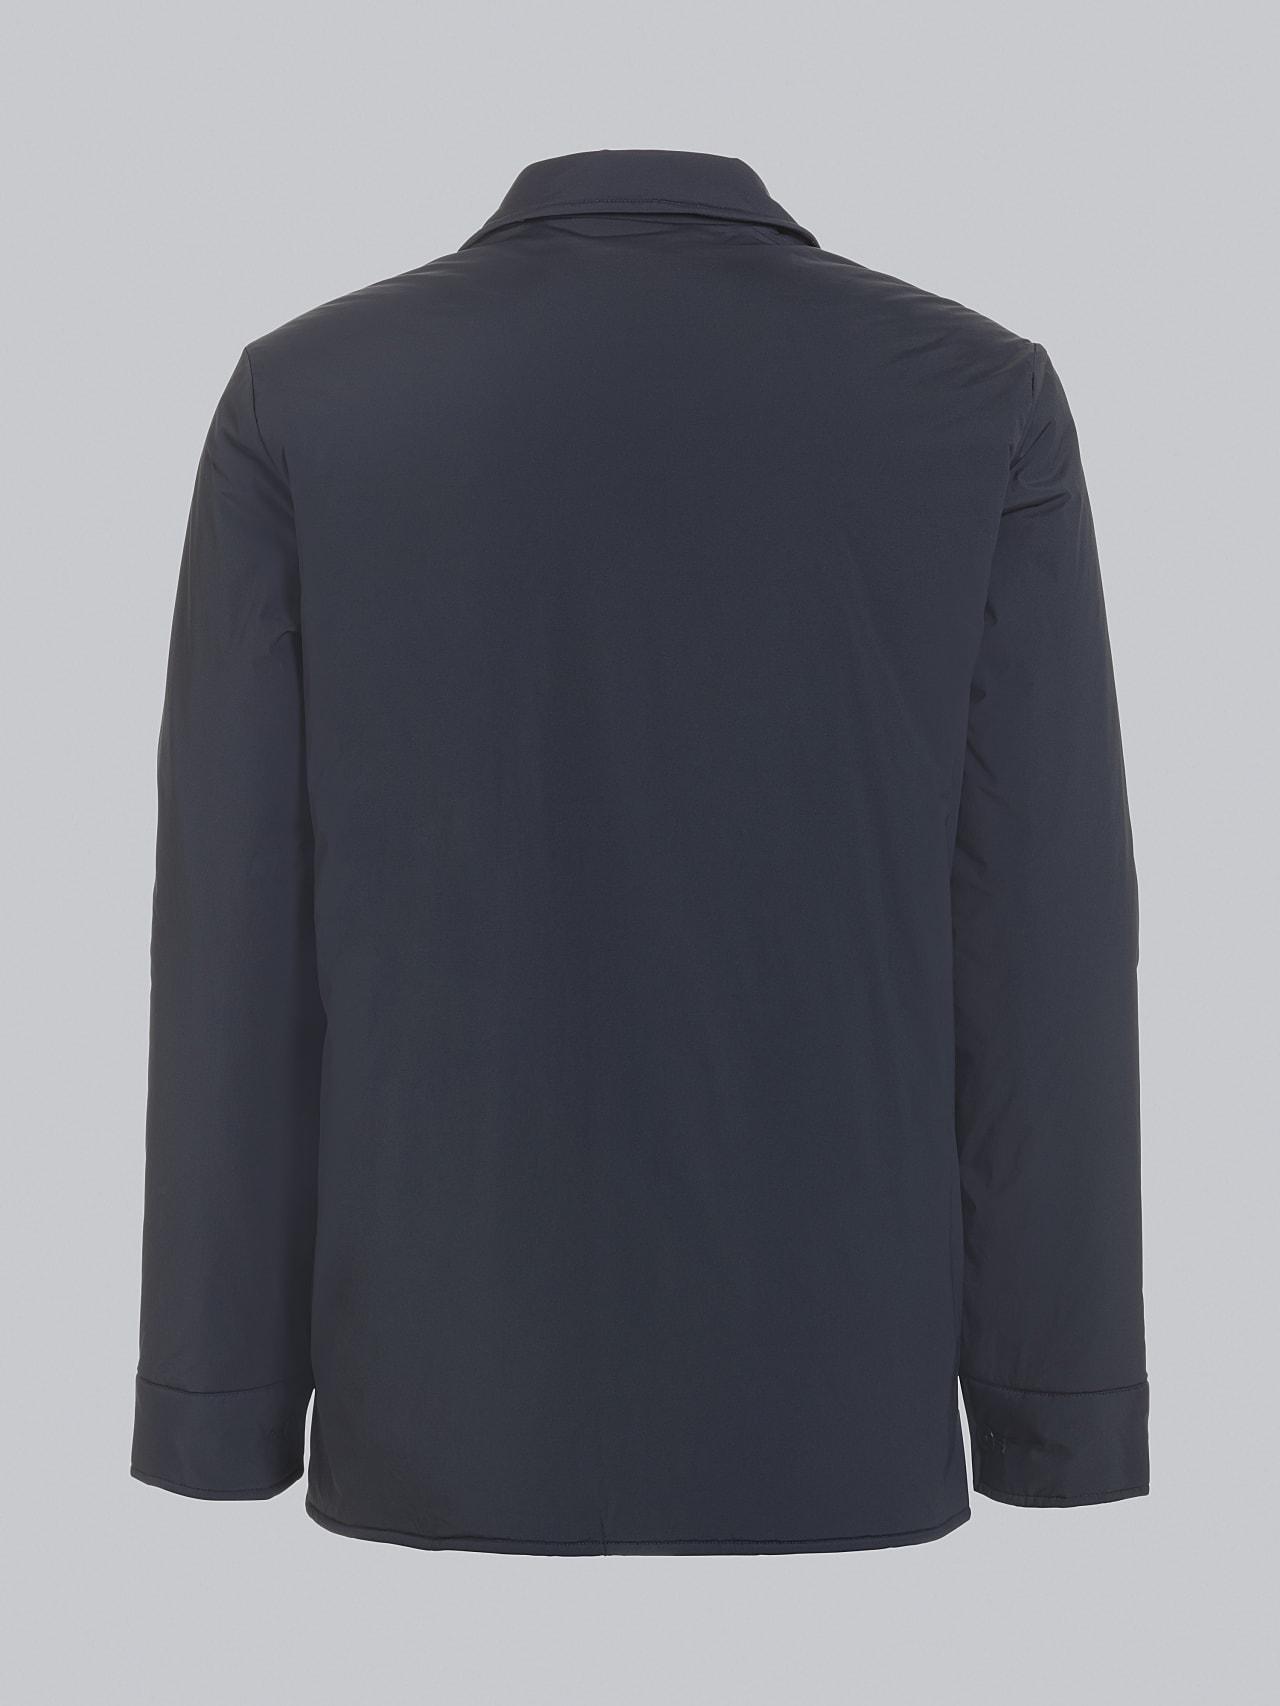 OVASU V1.Y5.02 PrimaLoft® Overshirt Jacket navy Left Alpha Tauri